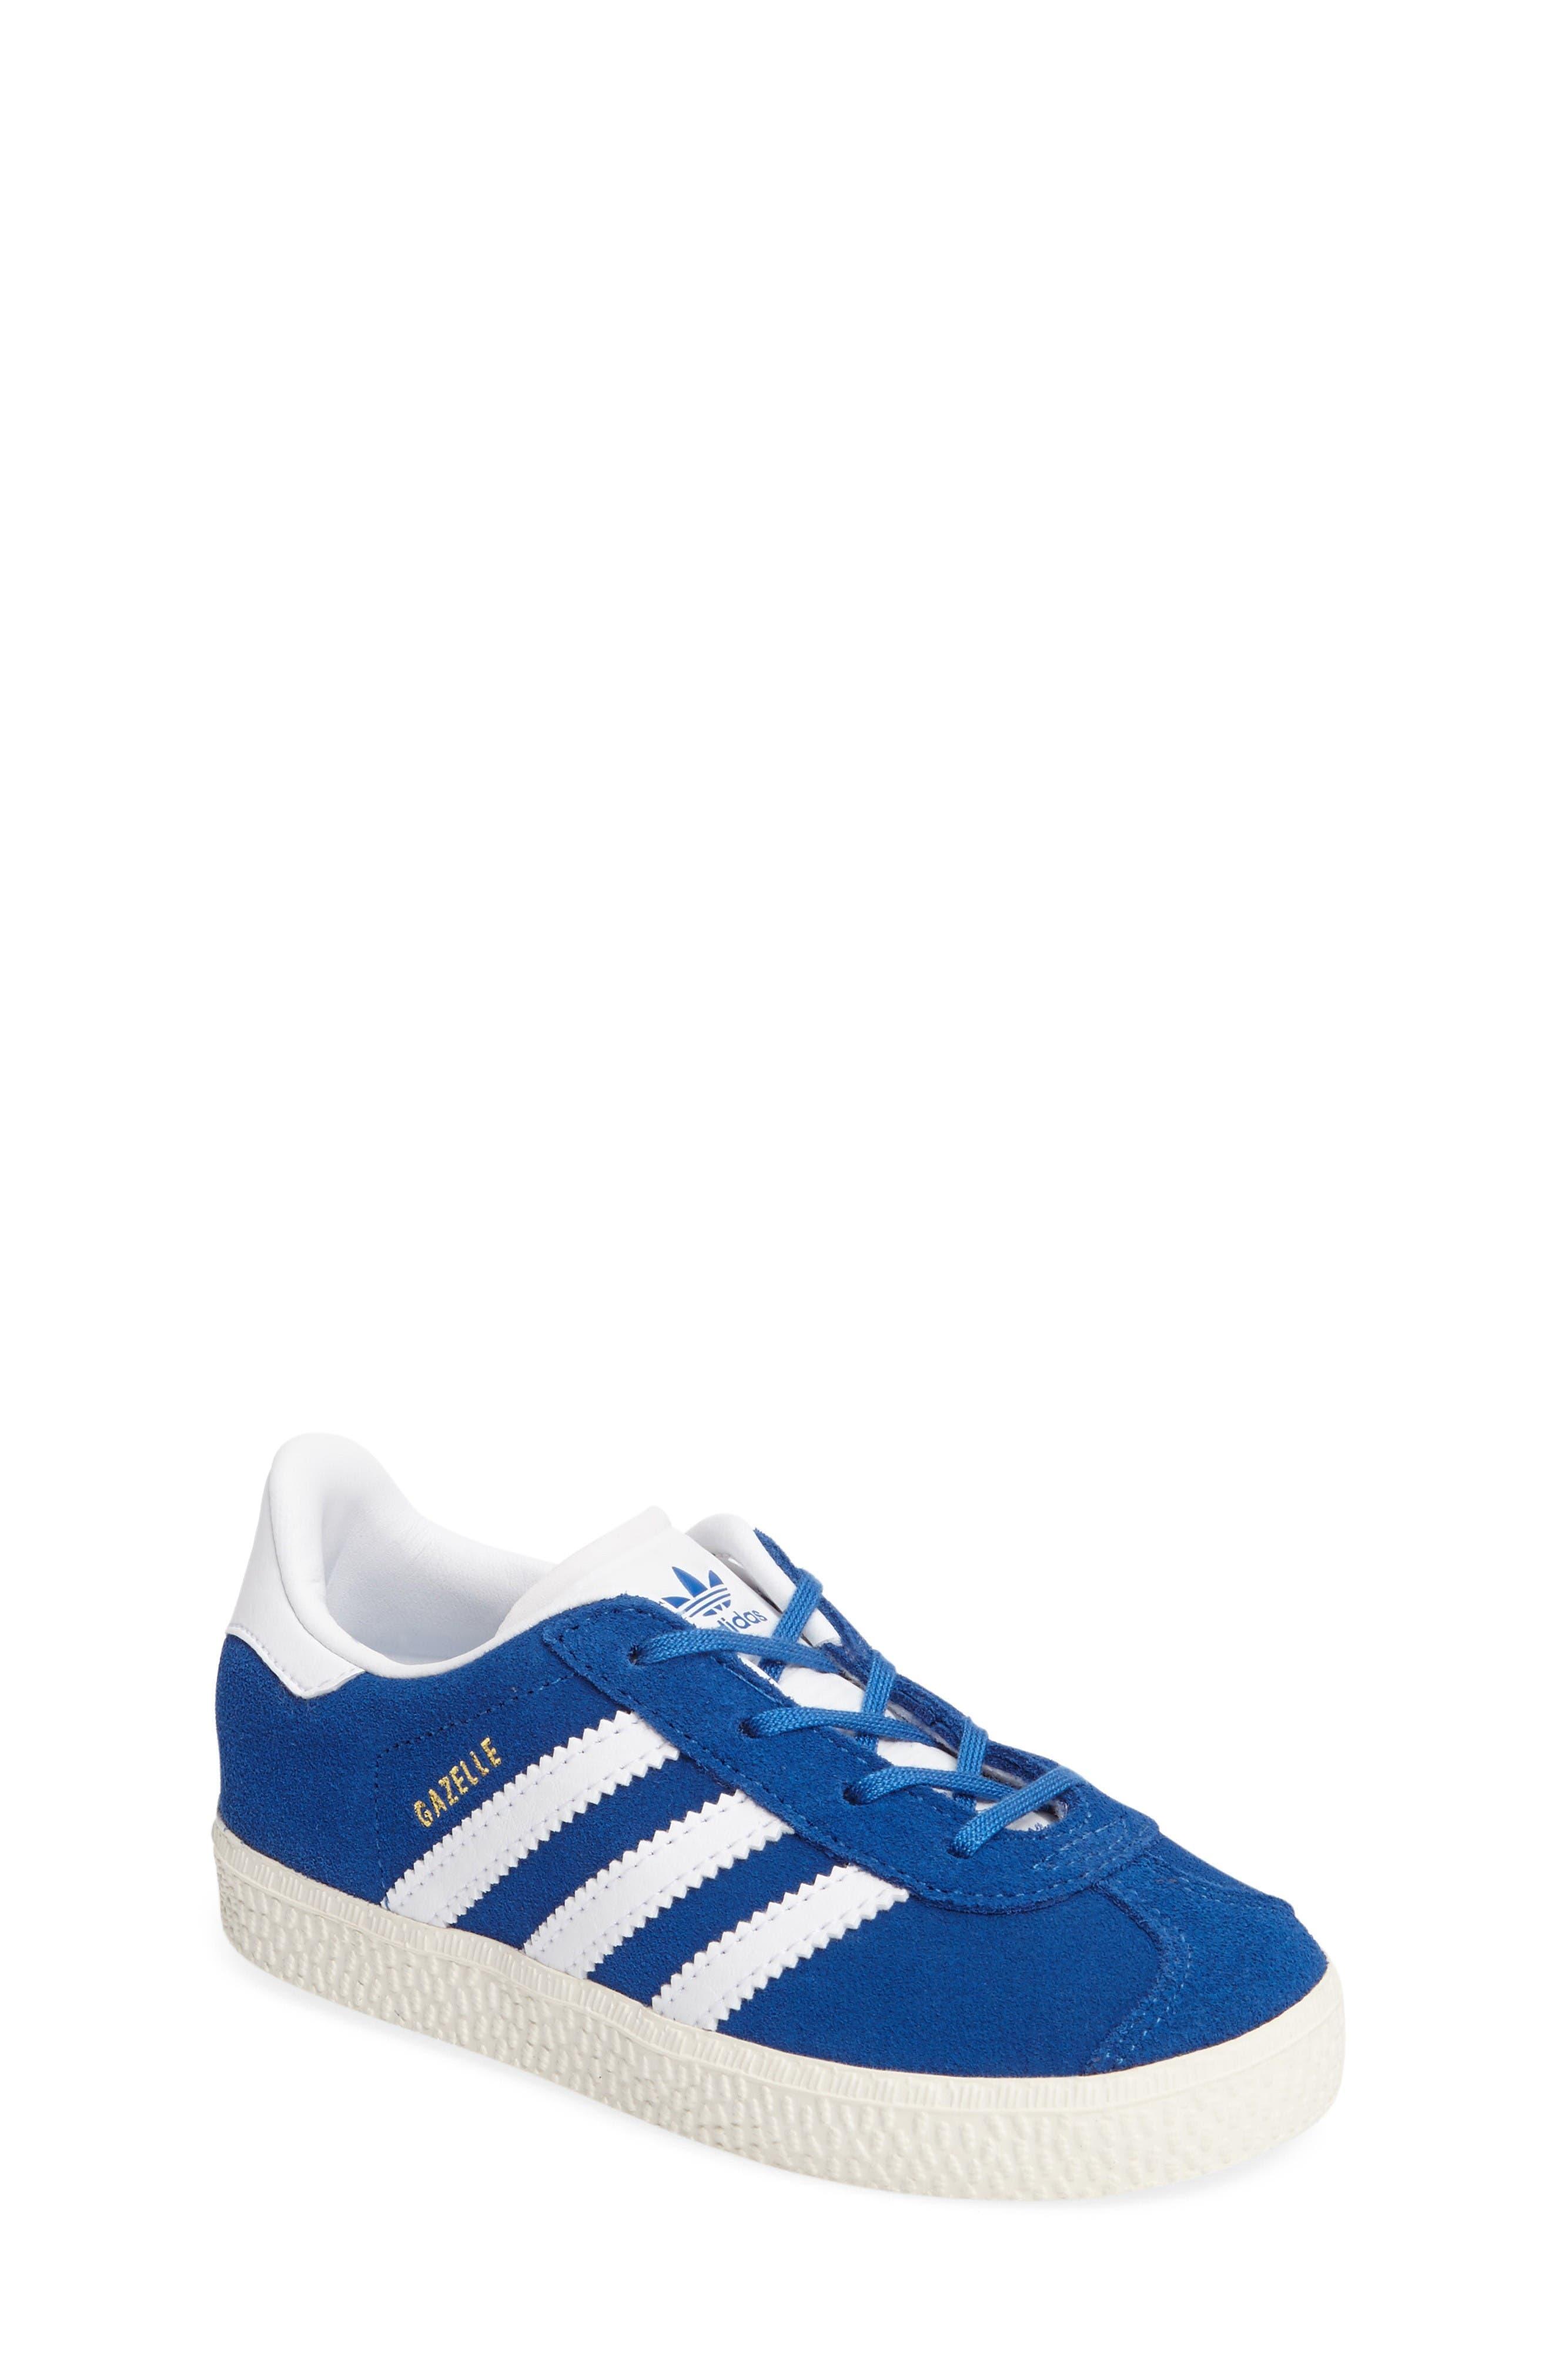 Gazelle Sneaker,                         Main,                         color, Blue/ White/ Gold Metallic